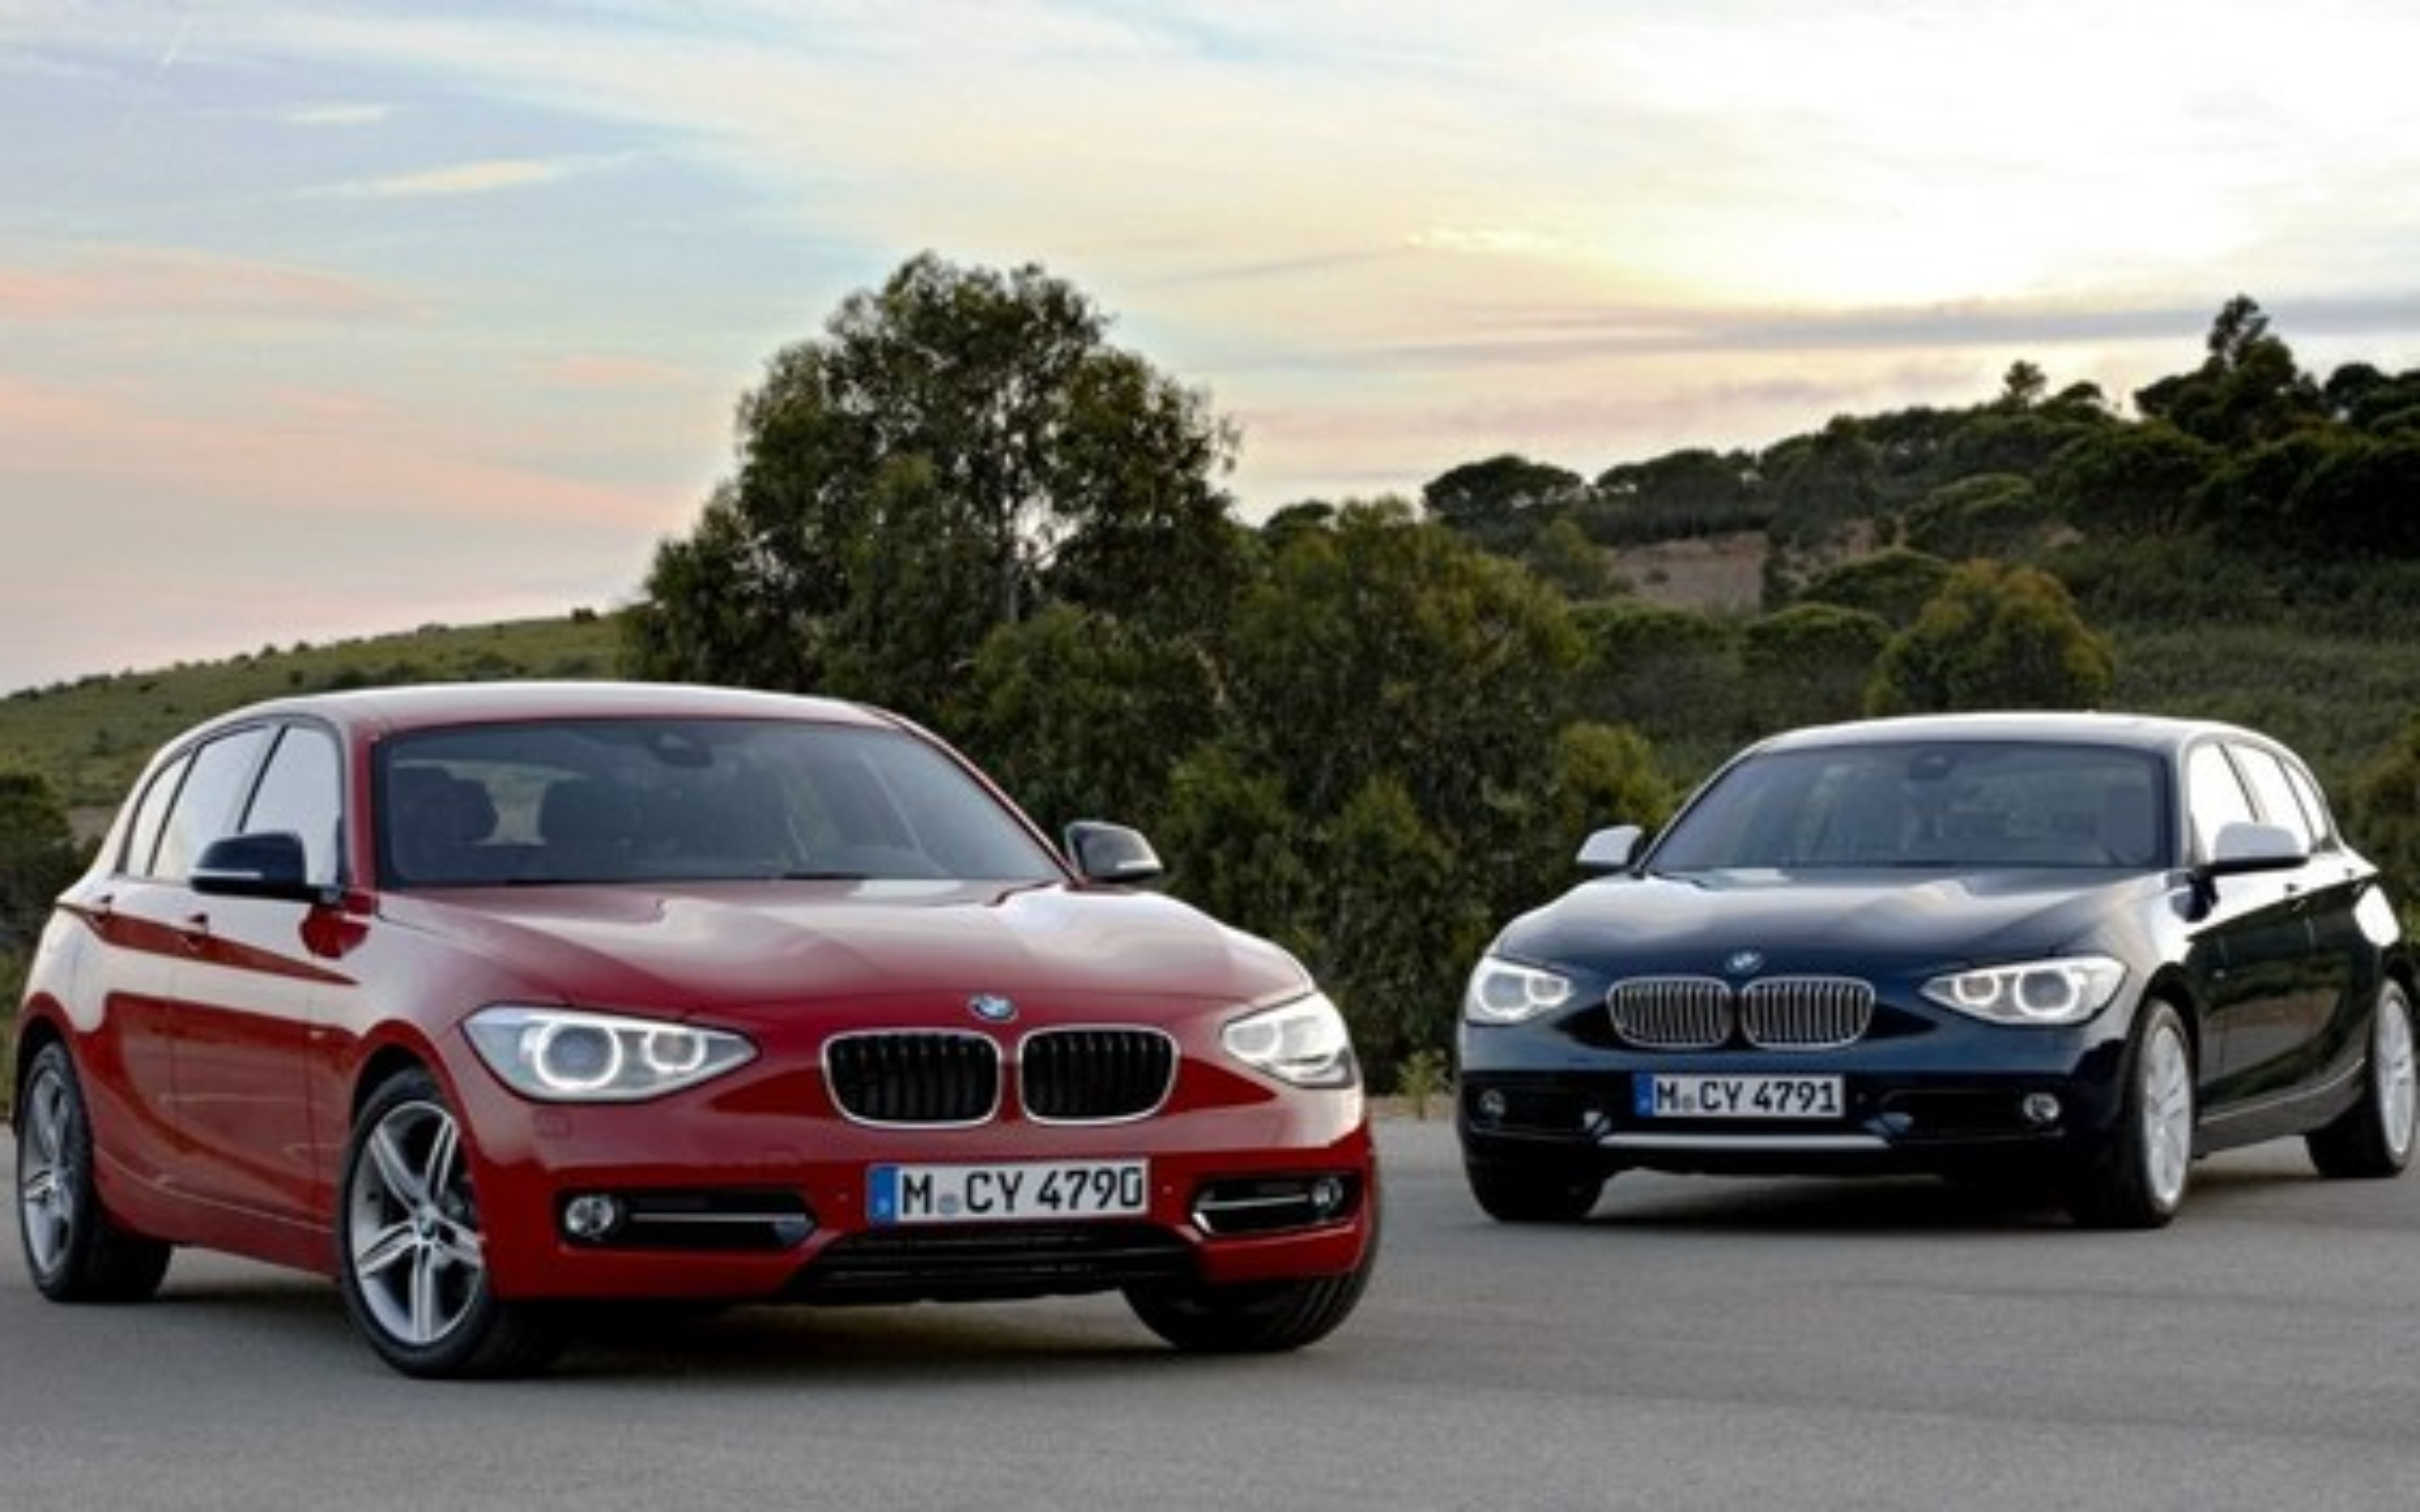 Особенности комплектаций BMW 1-Series F20 Line Sport и Line Urban